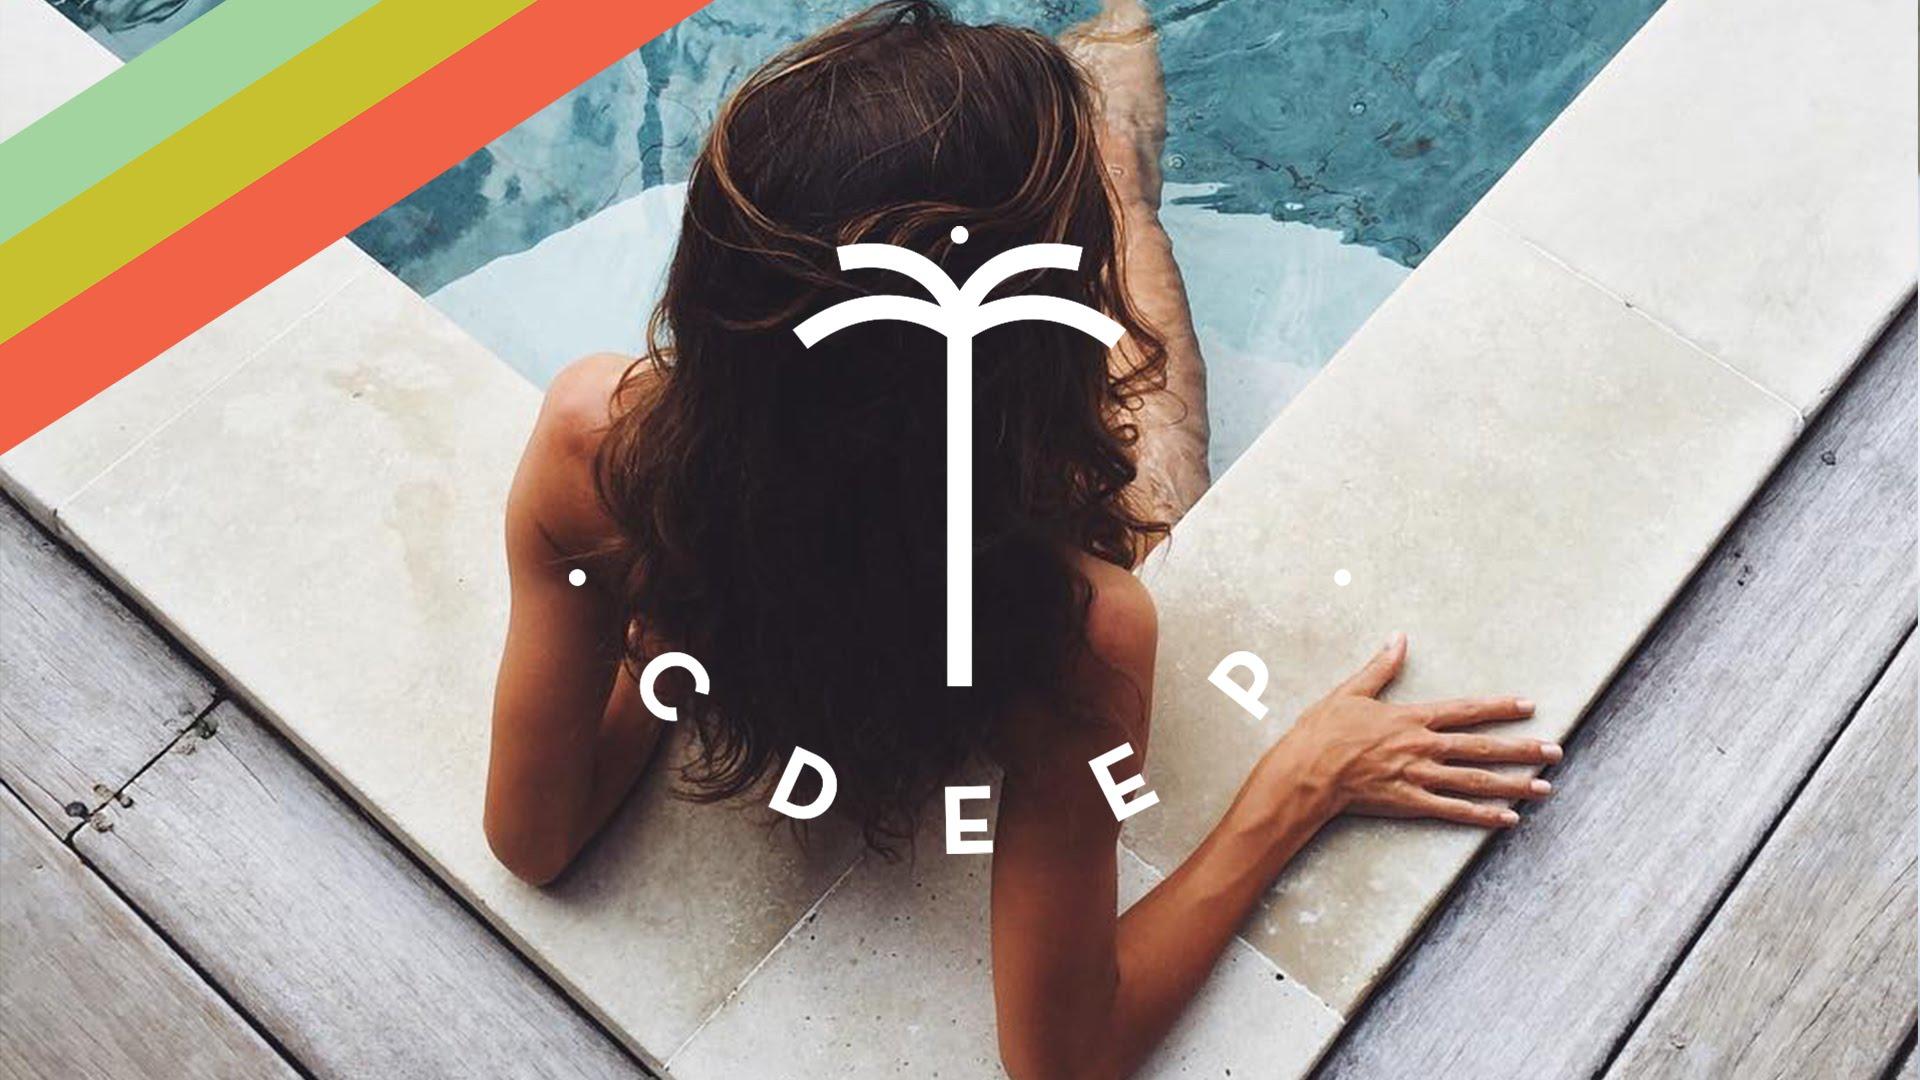 Midi Culture - On My Mind